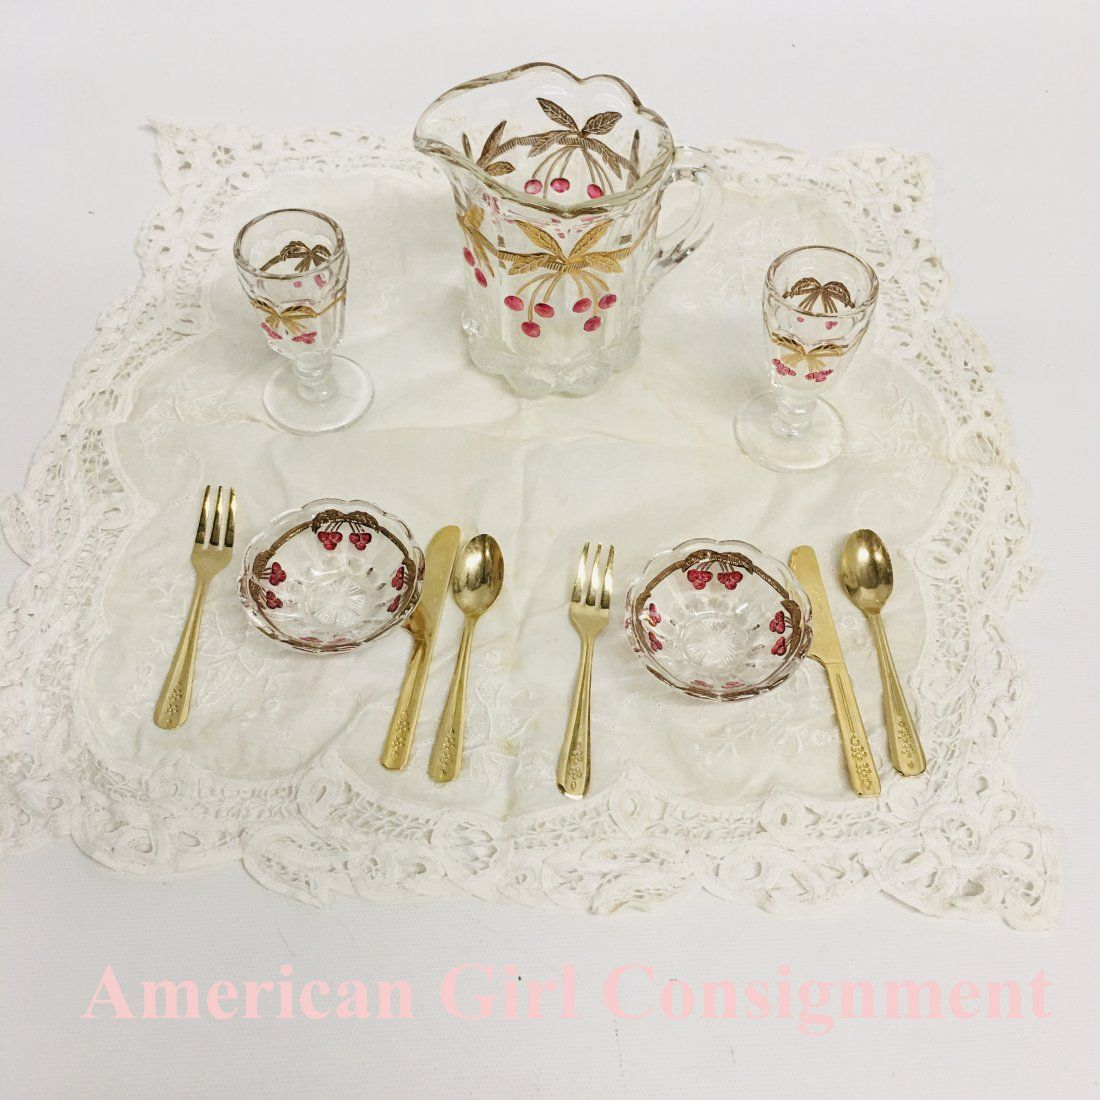 American Girl Doll Samantha Victorian Lemonade Set